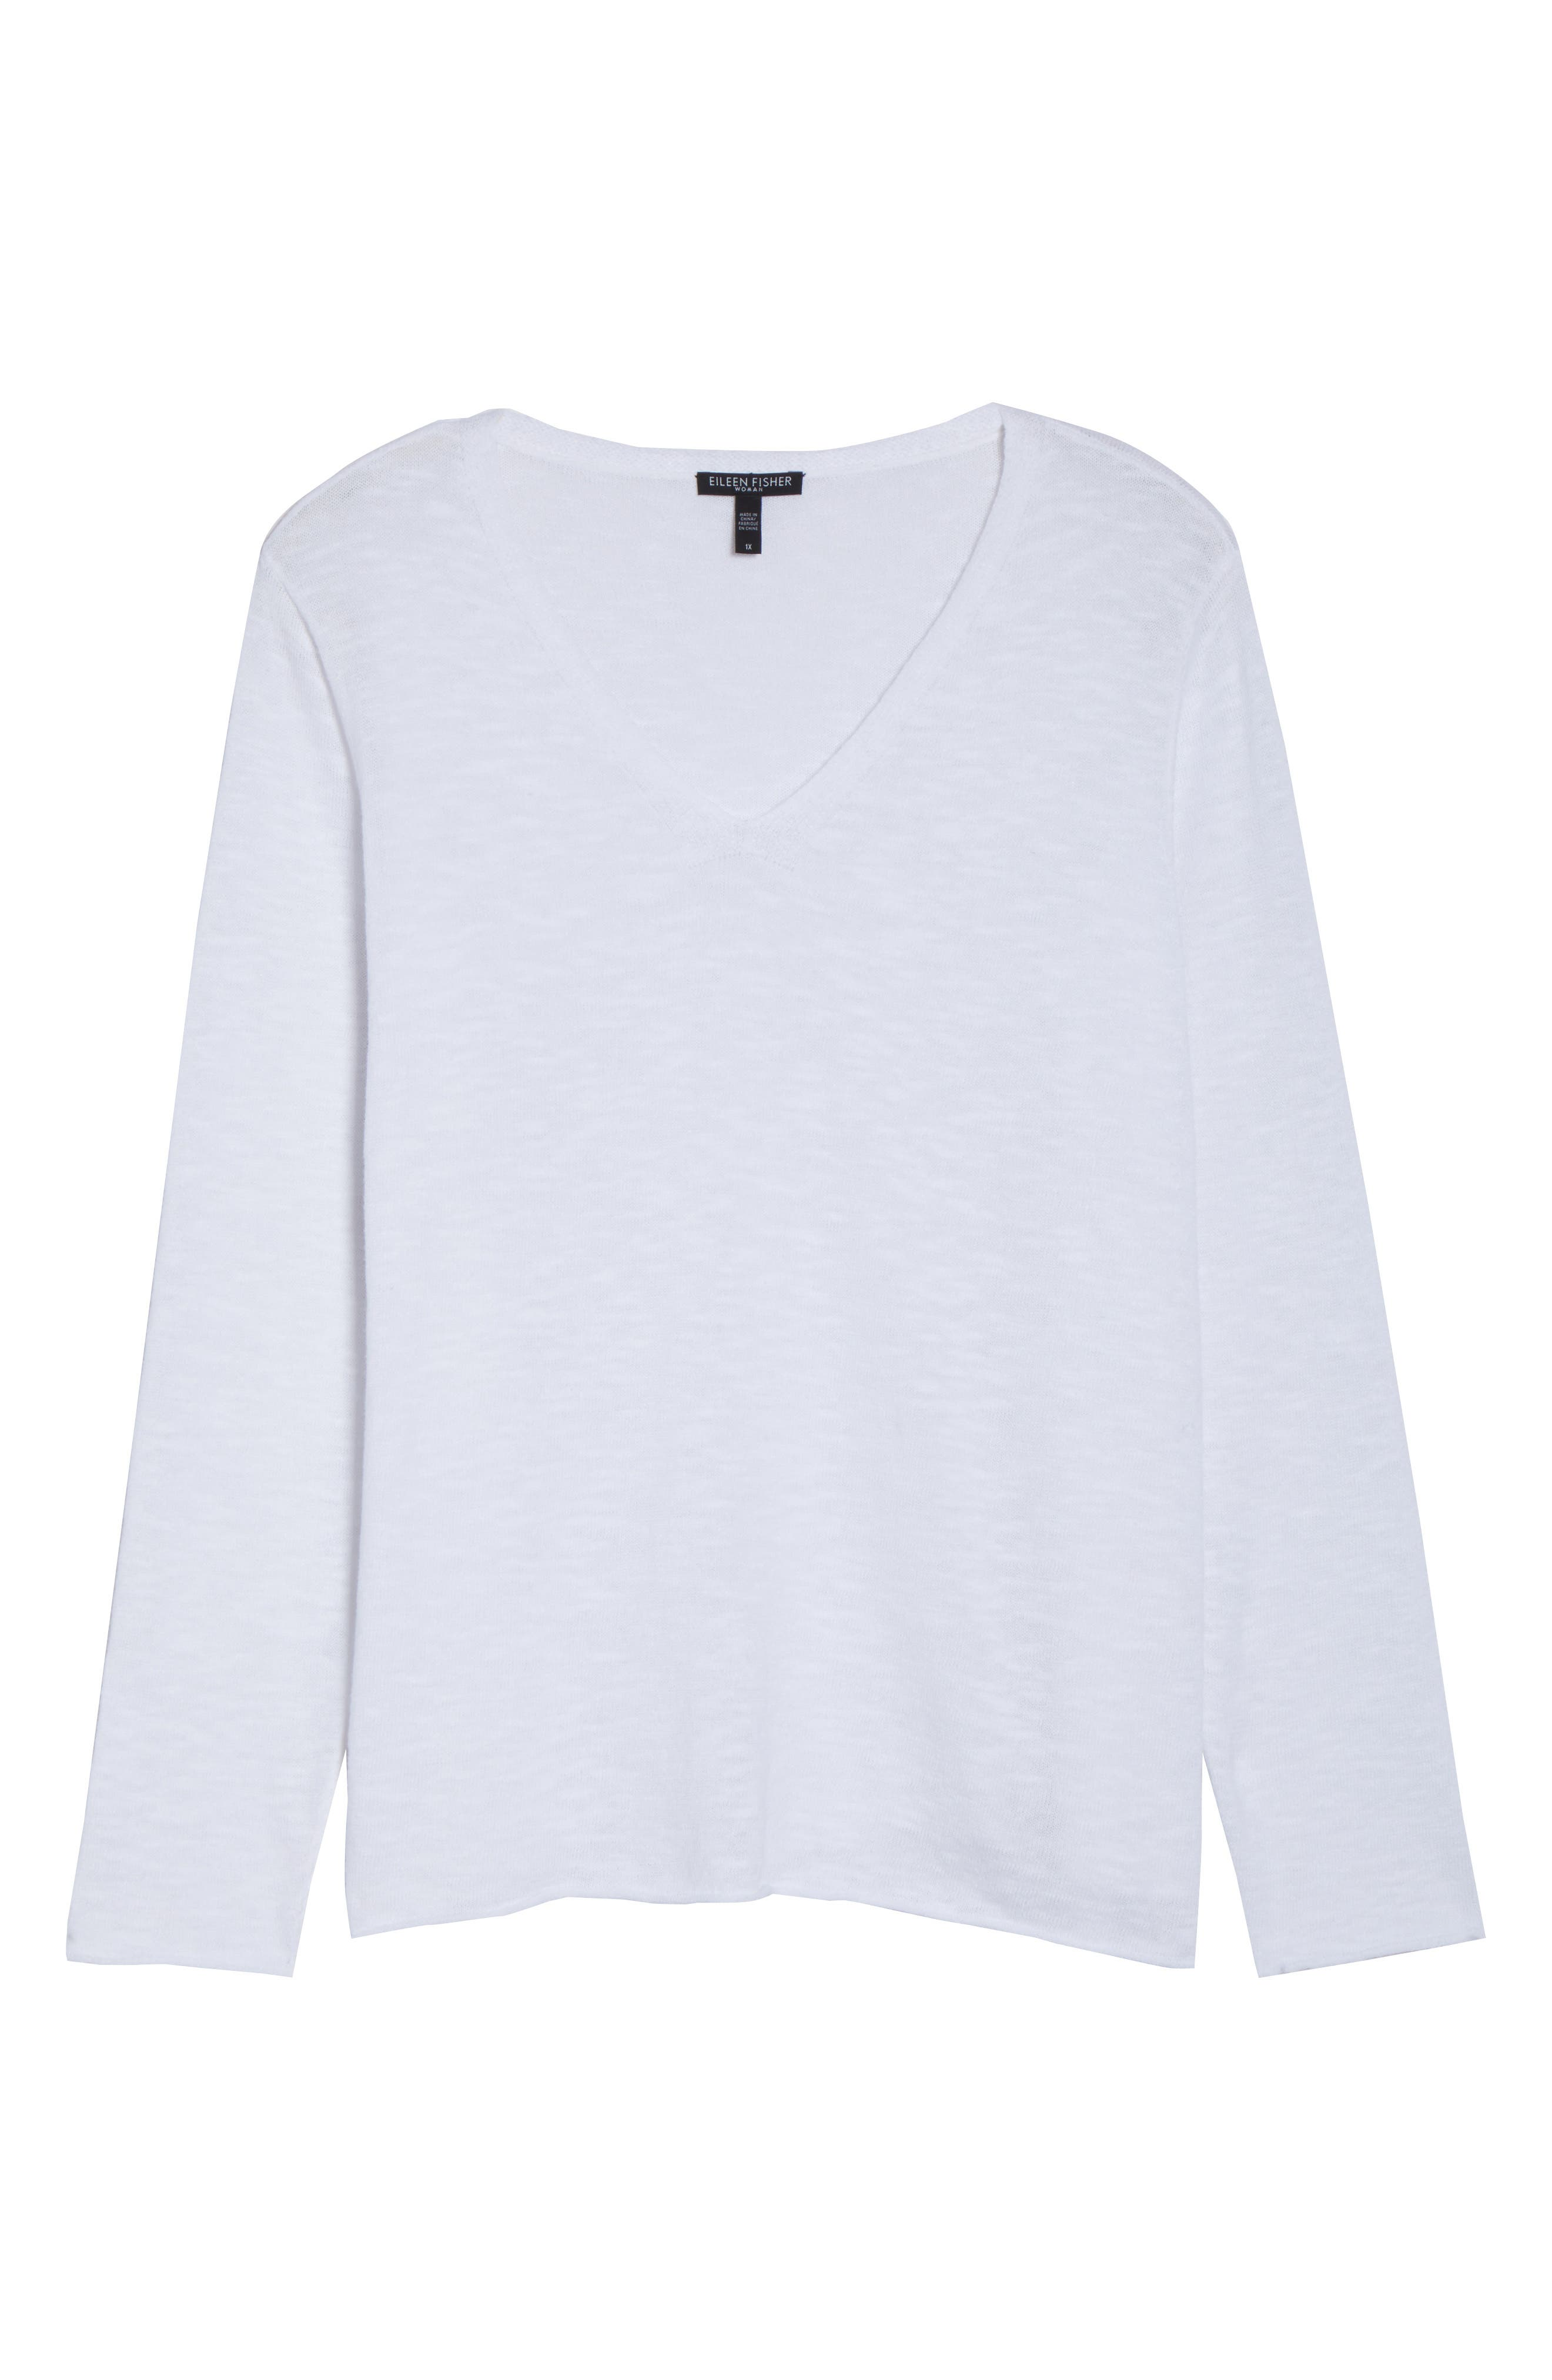 Boxy Organic Linen & Cotton Sweater,                             Alternate thumbnail 7, color,                             100